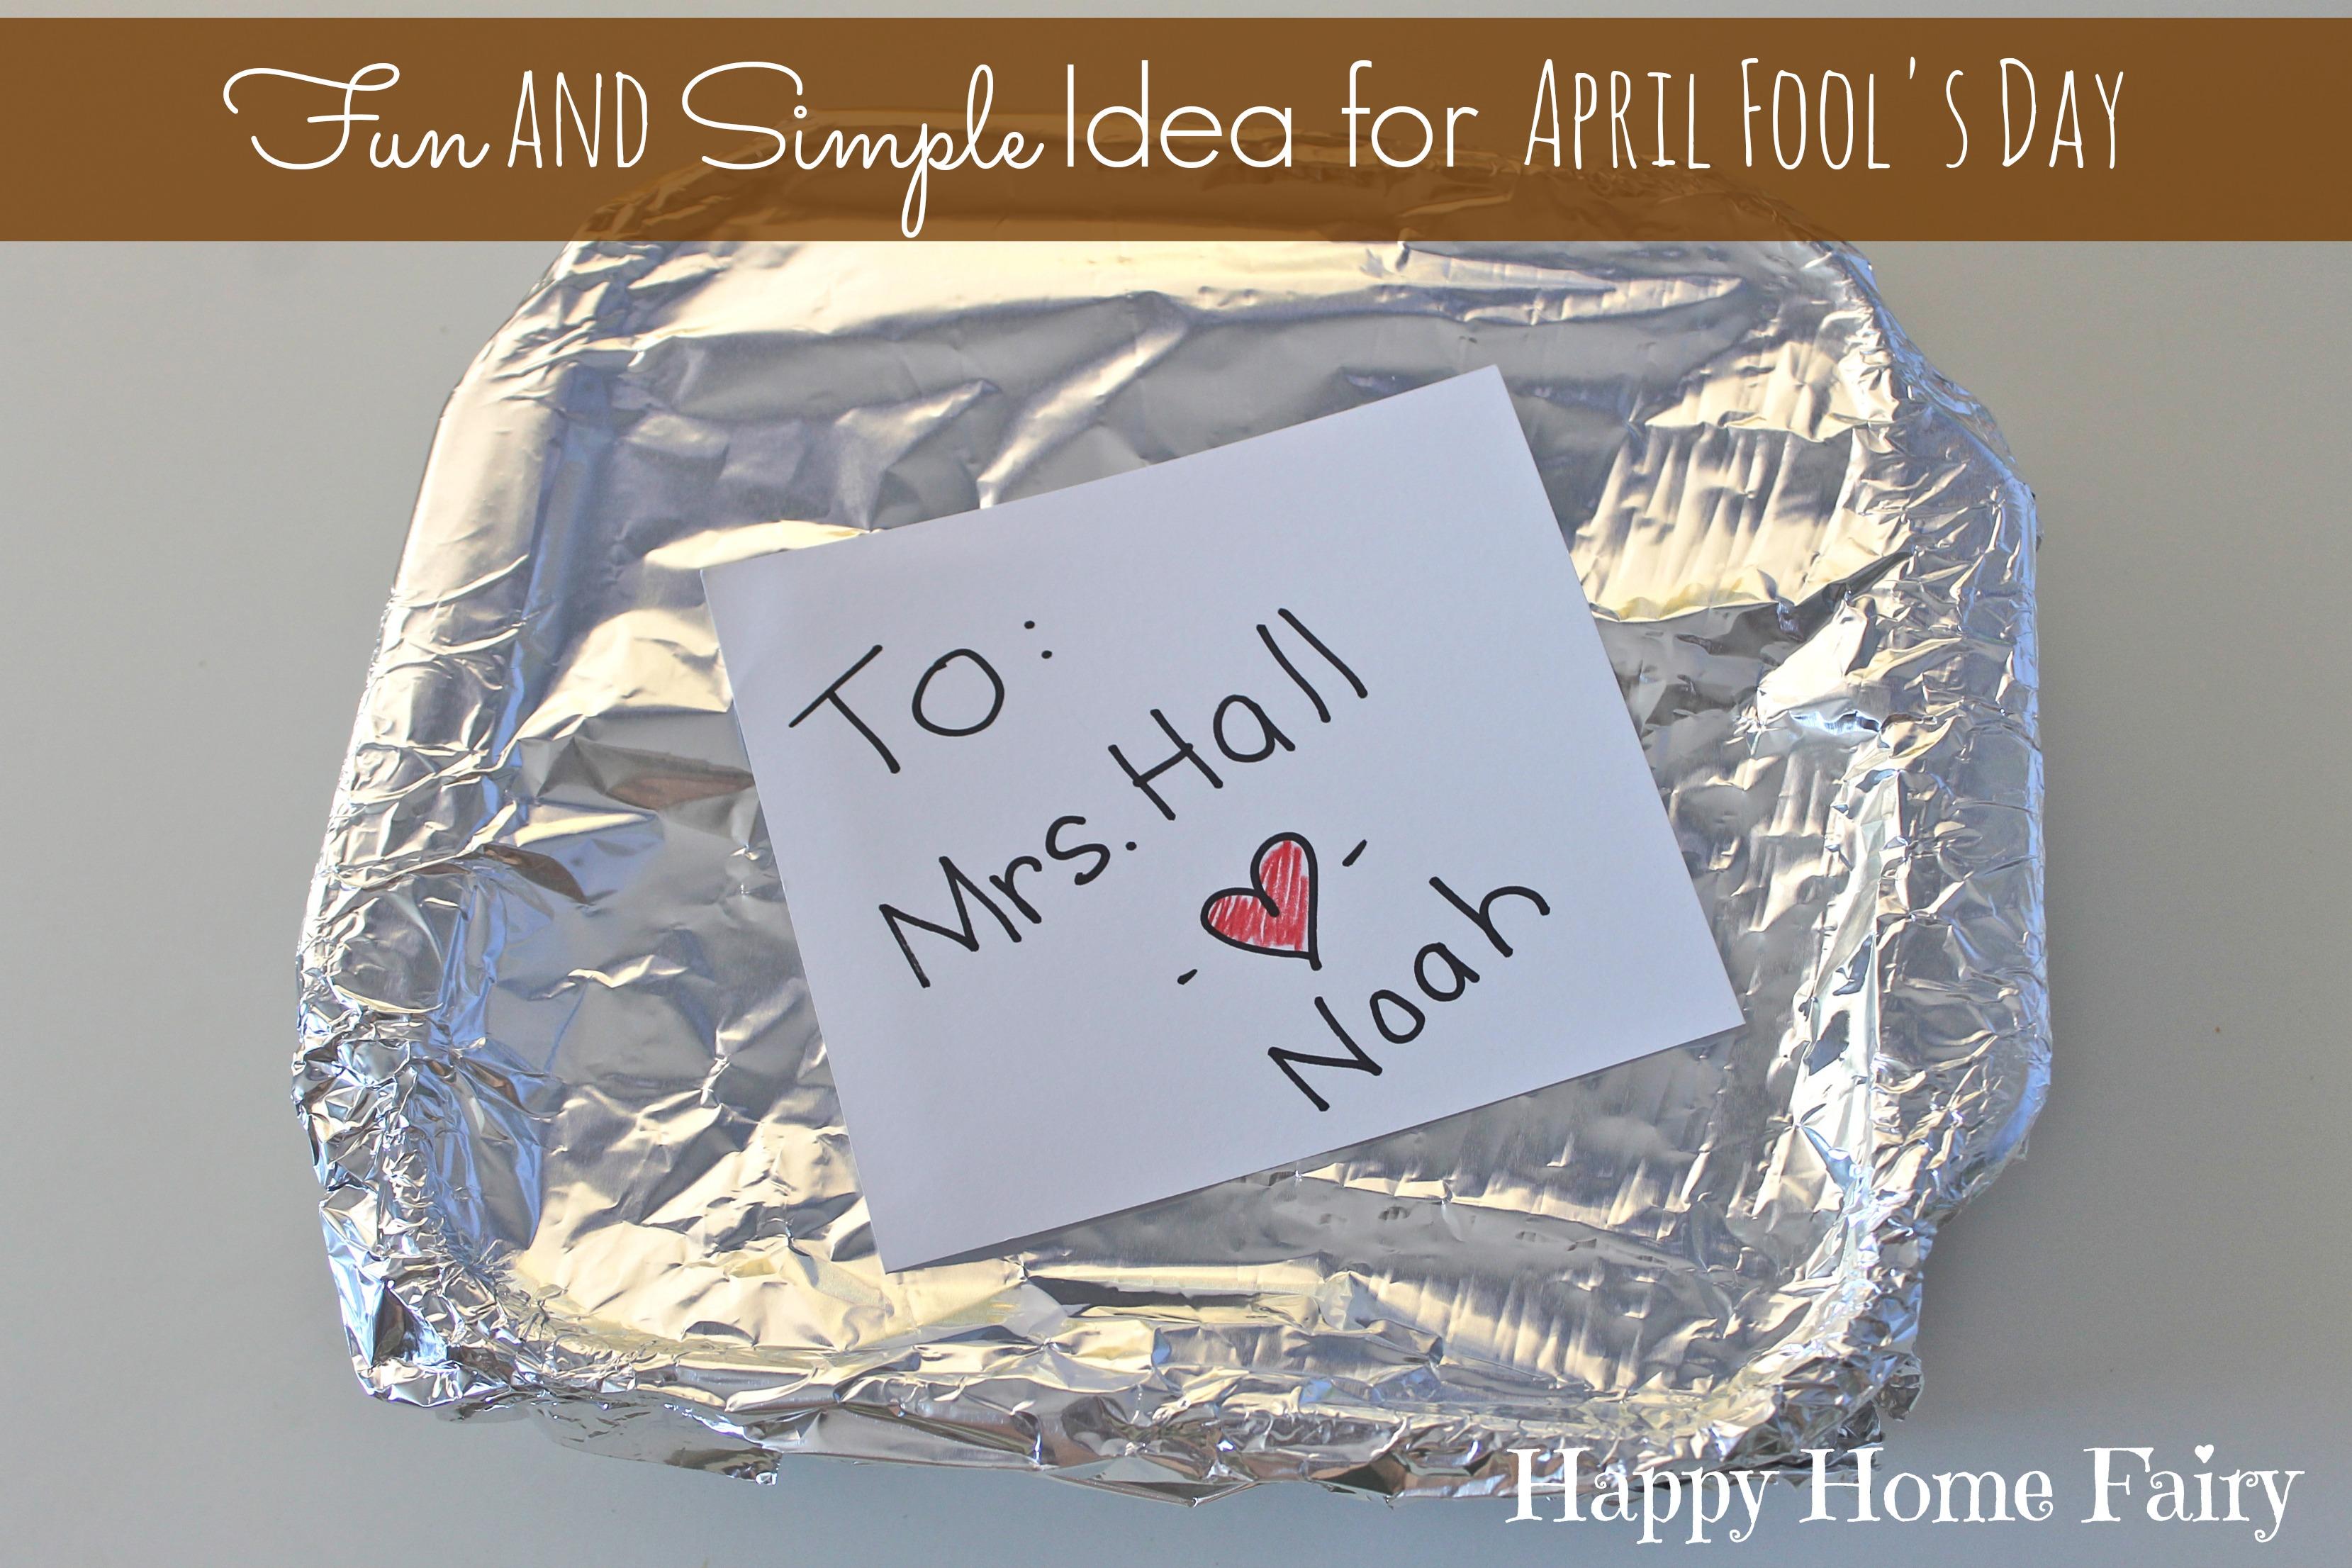 Last Minute Hilarious April Fool's Day Joke - Happy Home Fairy [ 2212 x 3318 Pixel ]